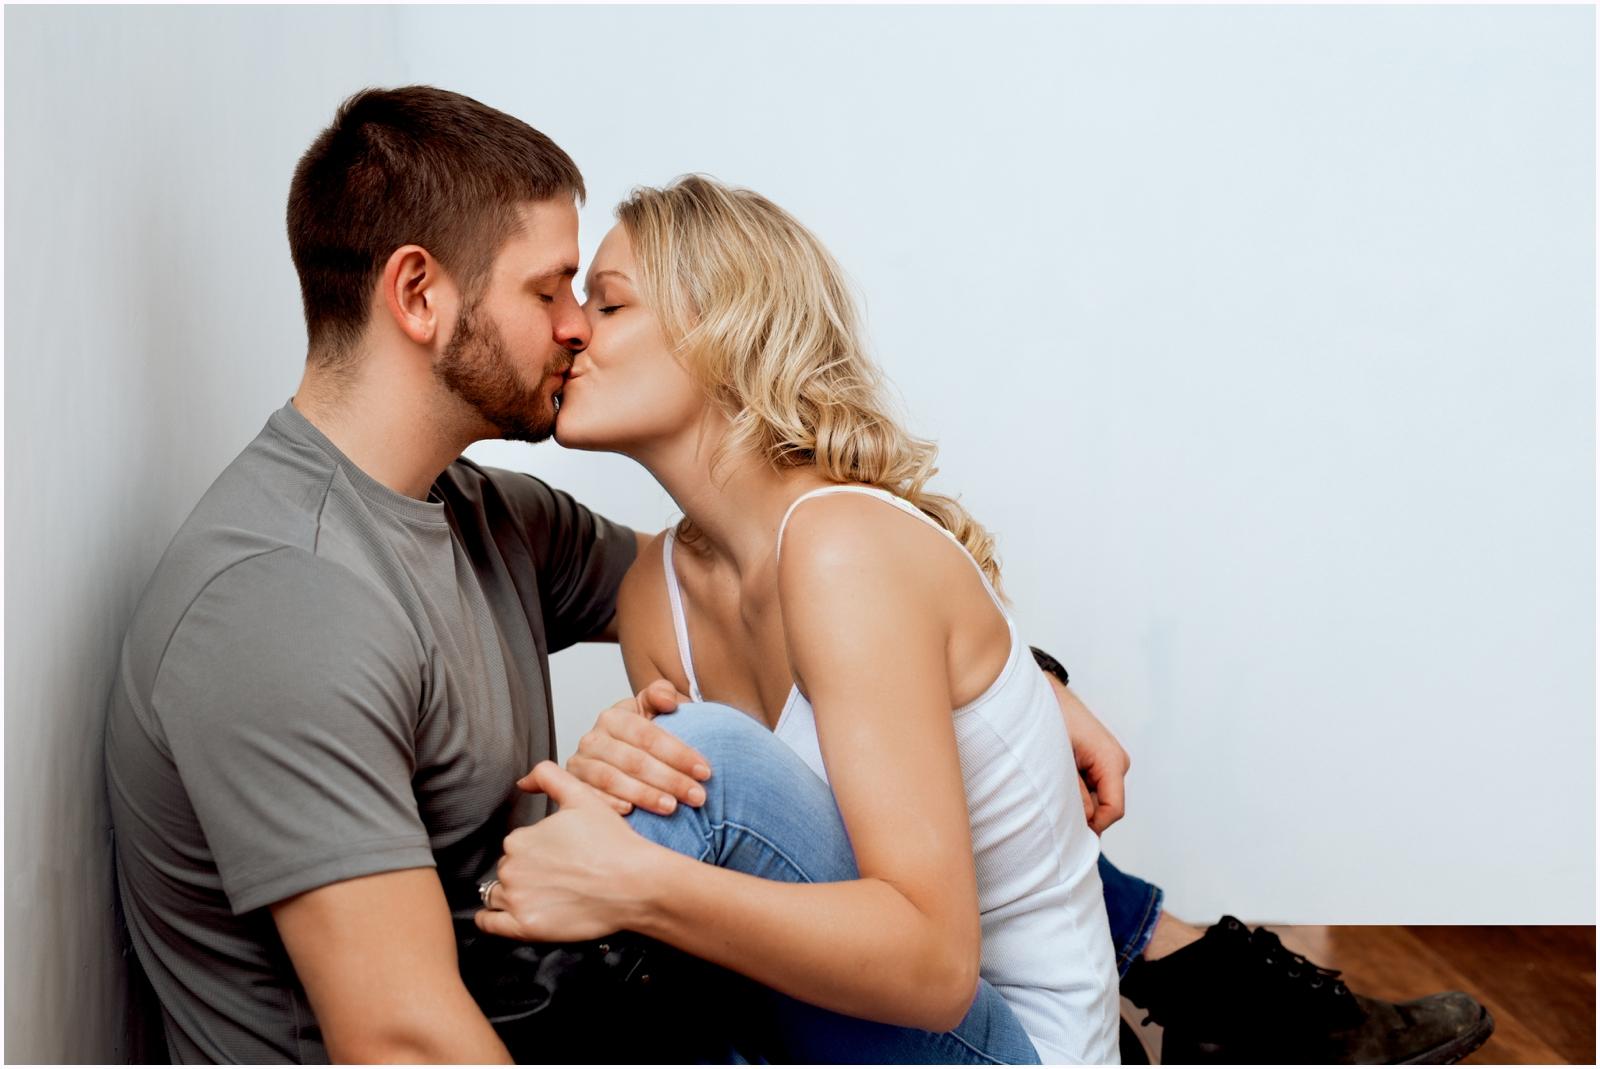 couple_jamie_leonard_photography_youngwood_murrysville_greensburg_mount_pleasant.jpg